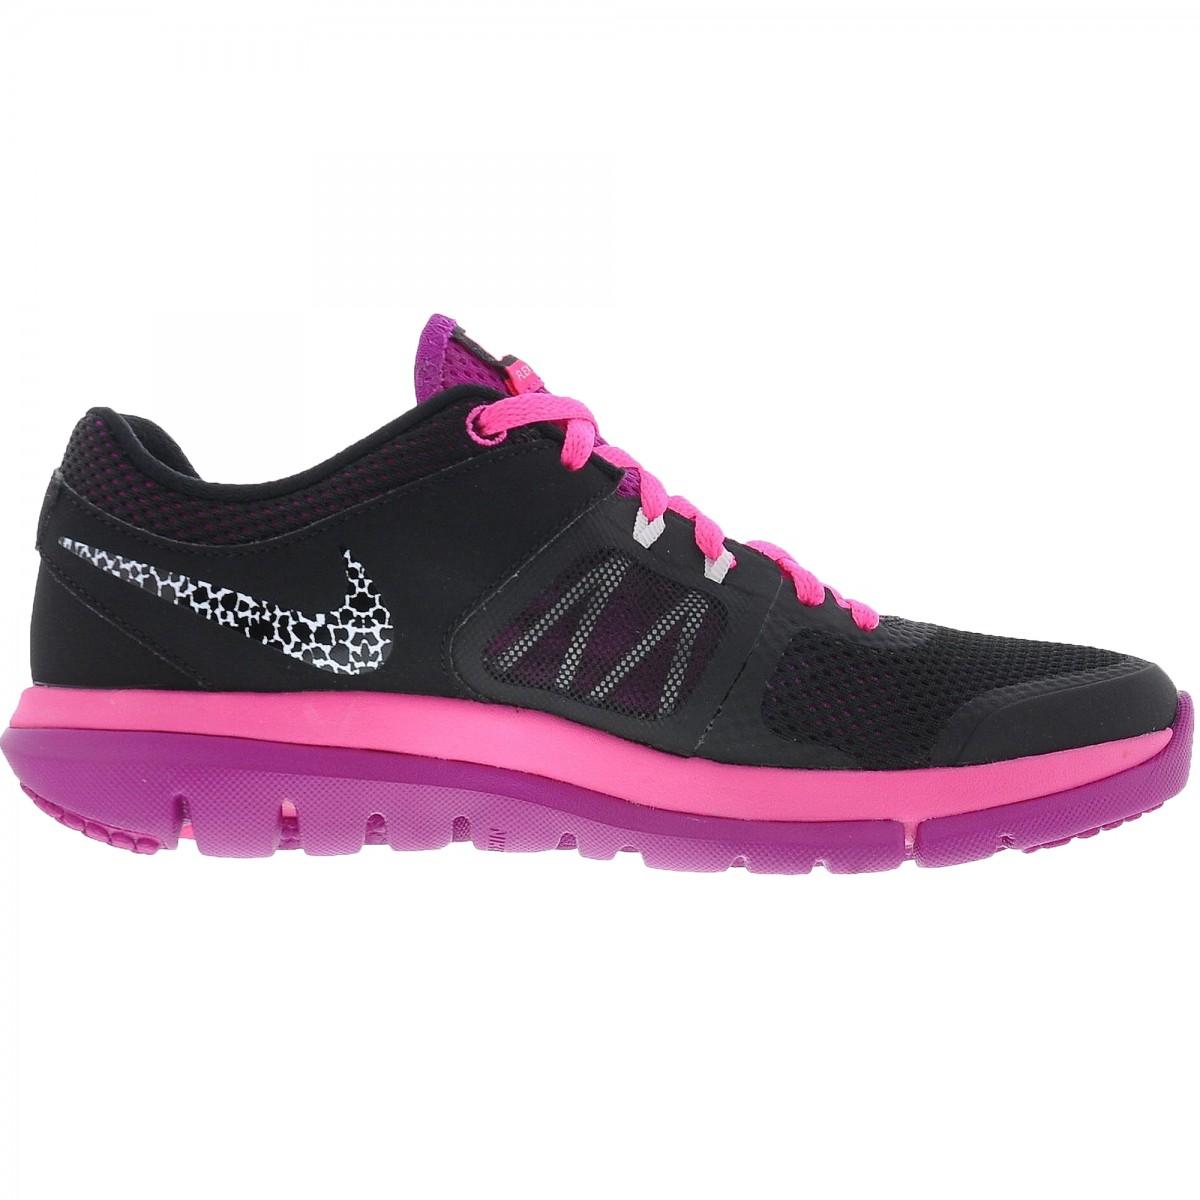 c2a29fd9bd3 Bizz Store - Tênis Feminino Nike Flex 2014 RN Para Academia